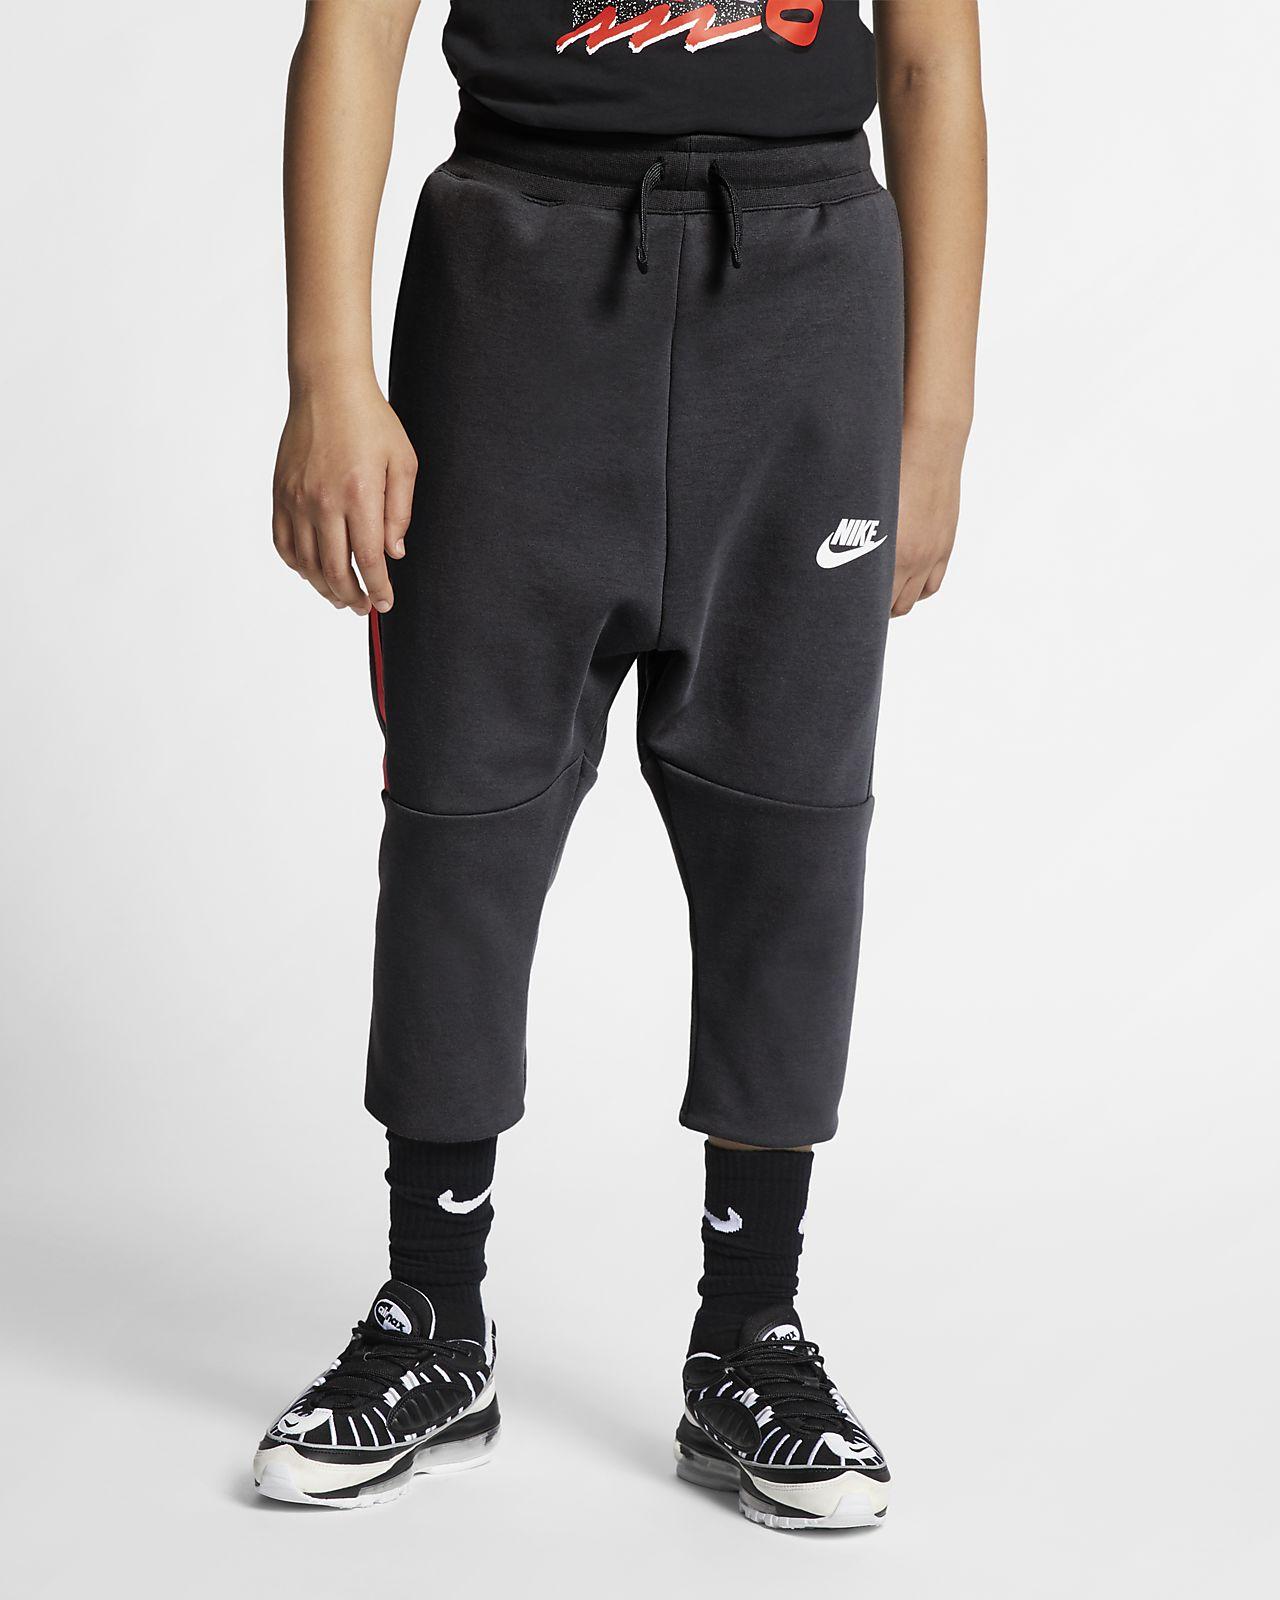 Pantalones cortos para niños talla grande Nike Sportswear Tech Fleece